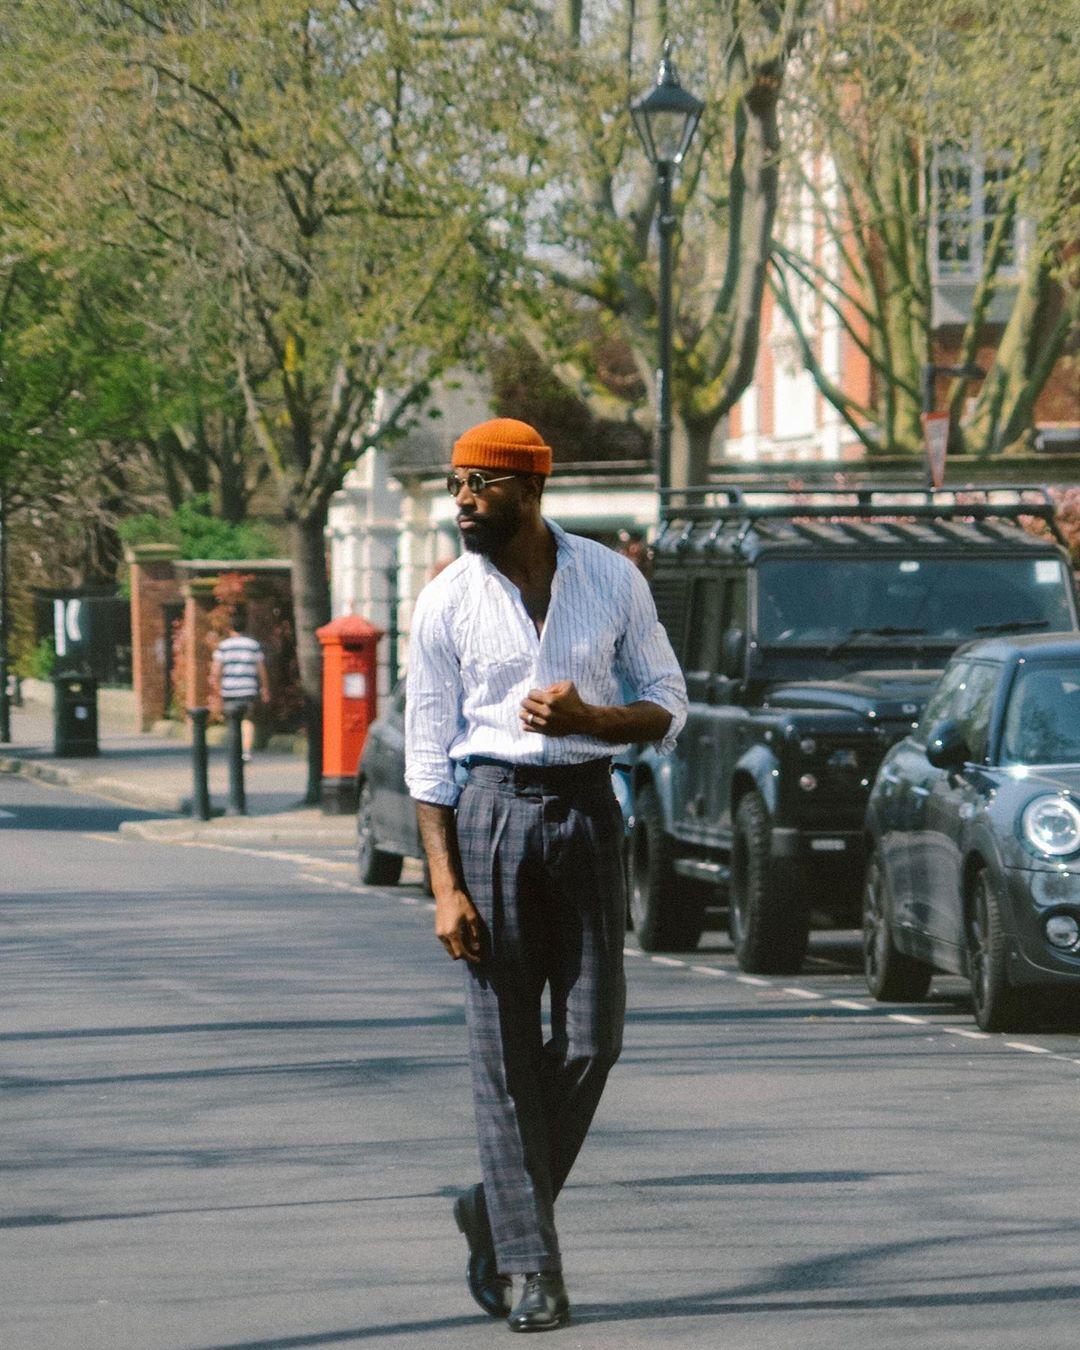 beanies-beanie-fashion-menswear-streetstyle-urban-fashion-accessories-hats-head-wears-style-rave